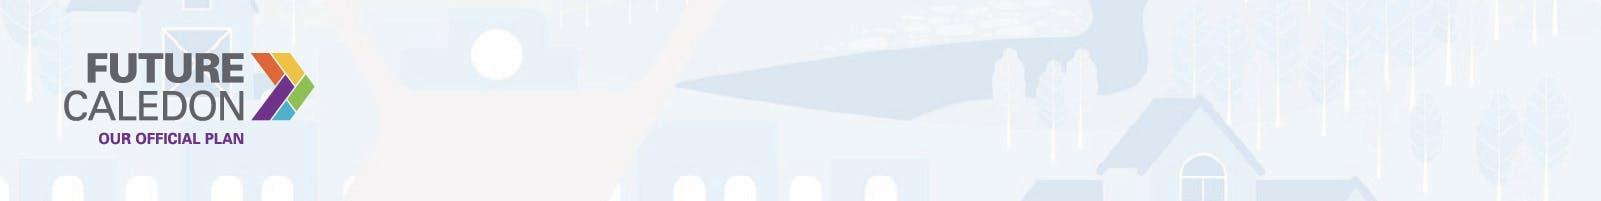 Future Caledon Logo Banner